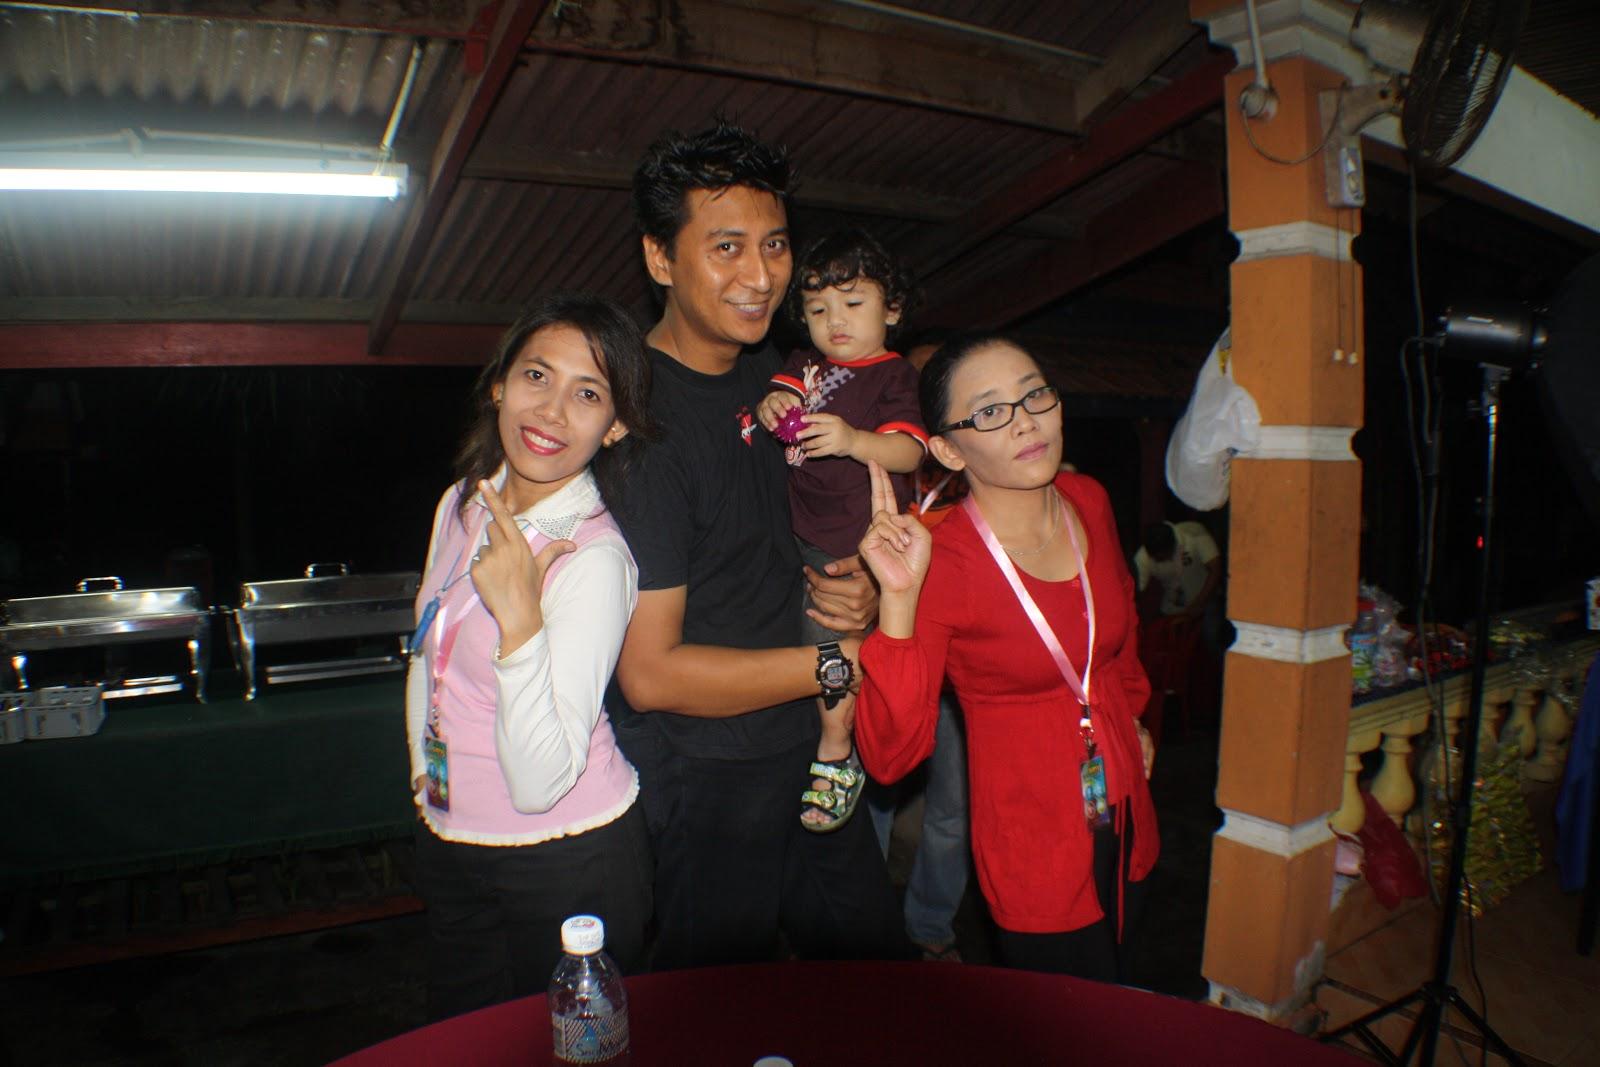 Resort Damar Suria Melaka Damar Suria Resort Melaka